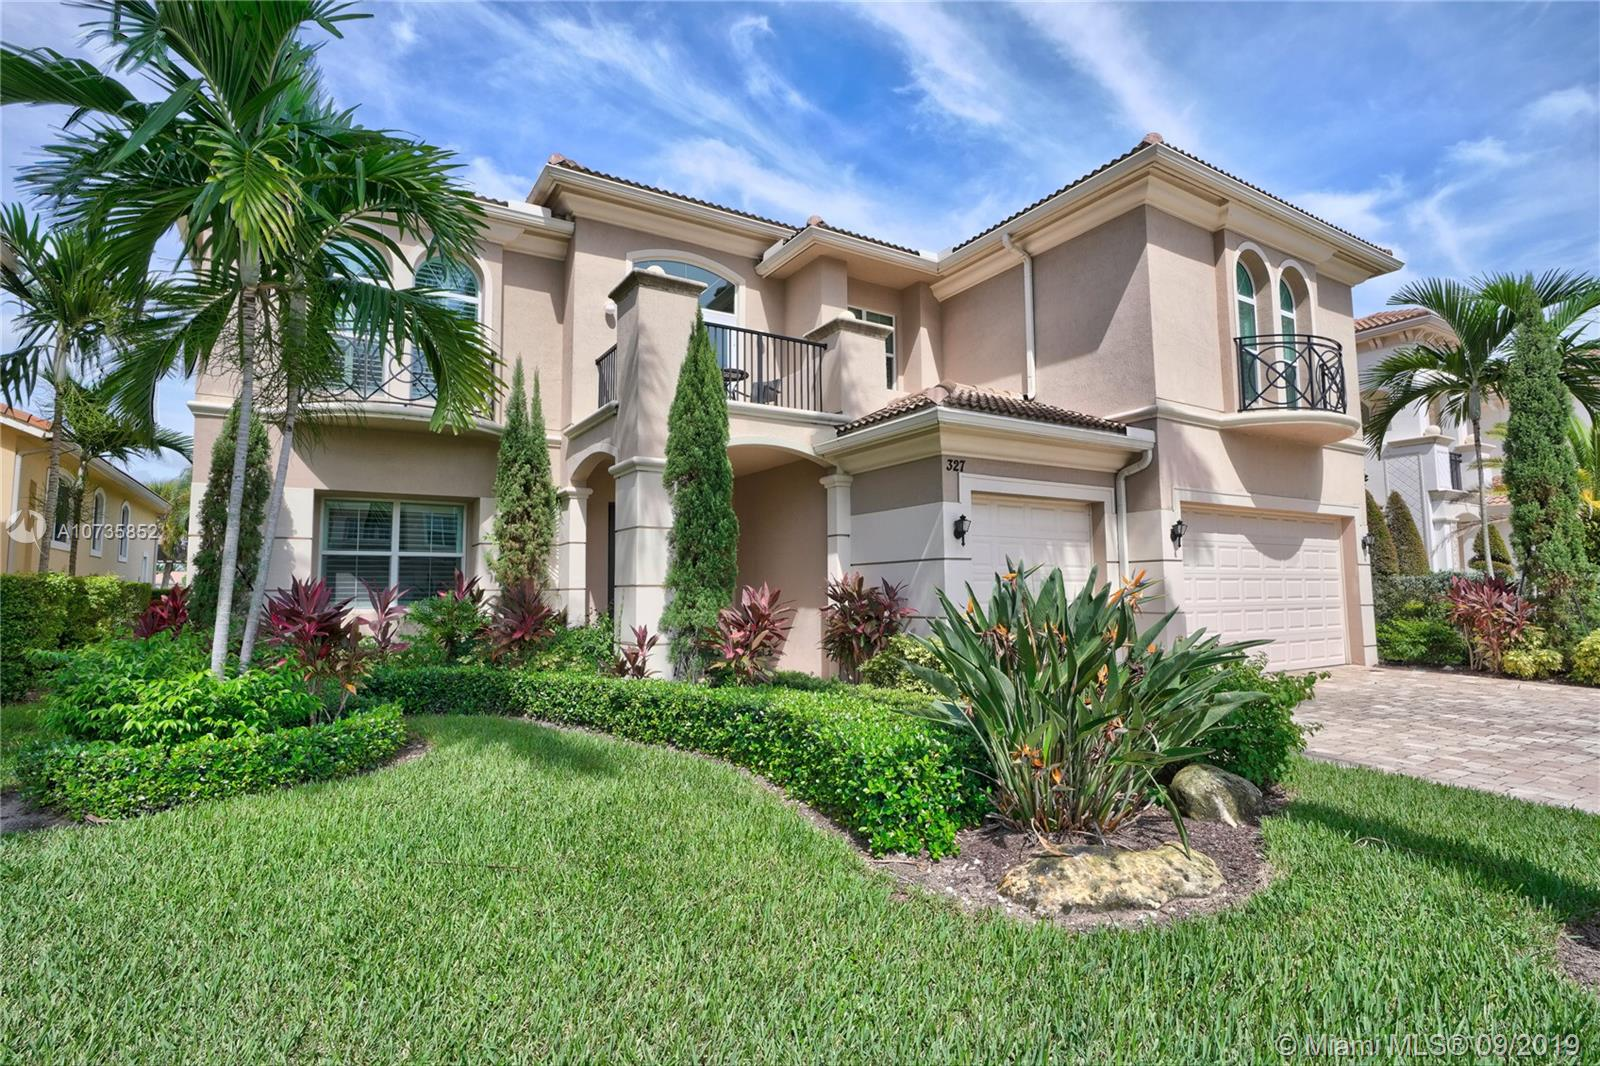 327 Charroux Dr, Palm Beach Gardens, FL 33410